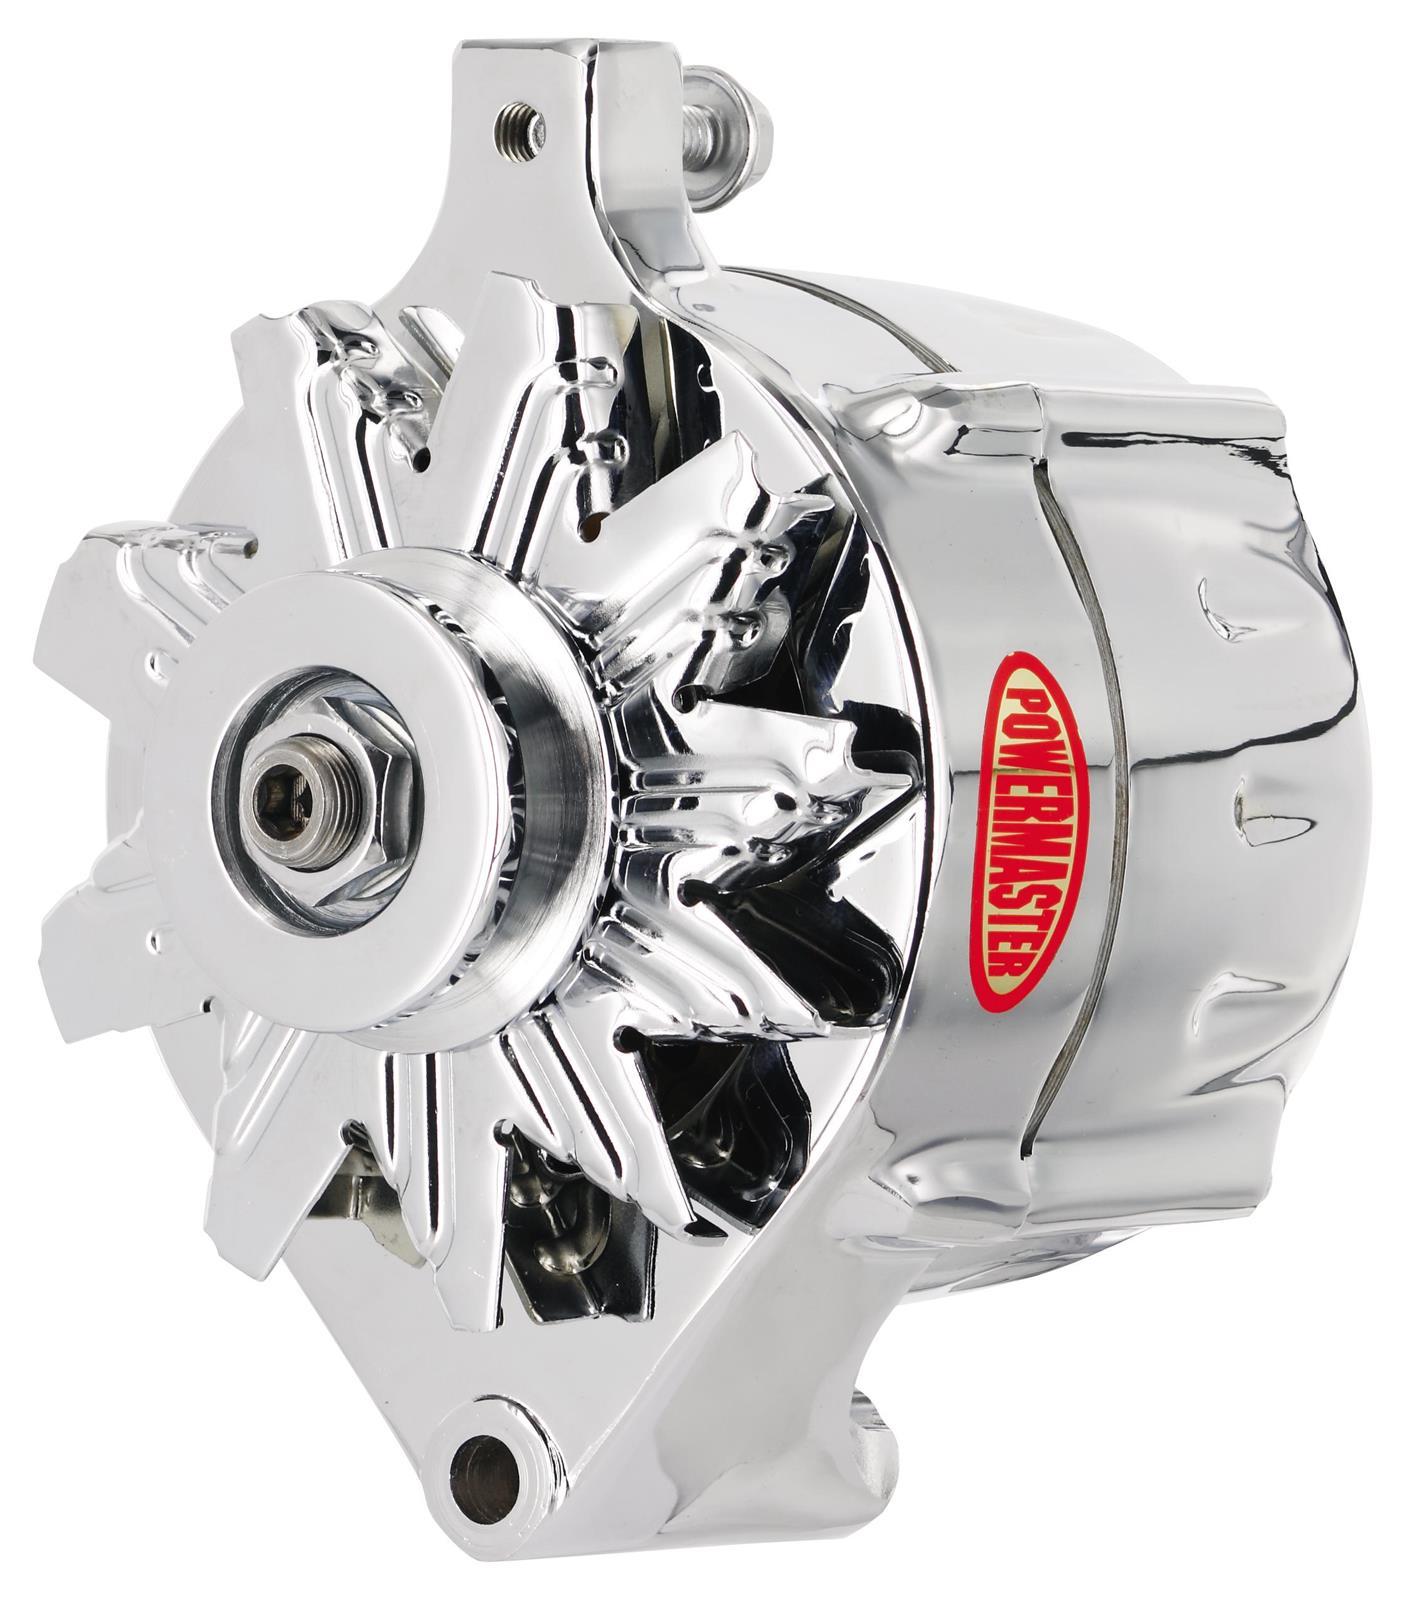 Powermaster Street Alternators 8 37141 Free Shipping On Orders Ford 1g Alternator Wiring Over 99 At Summit Racing